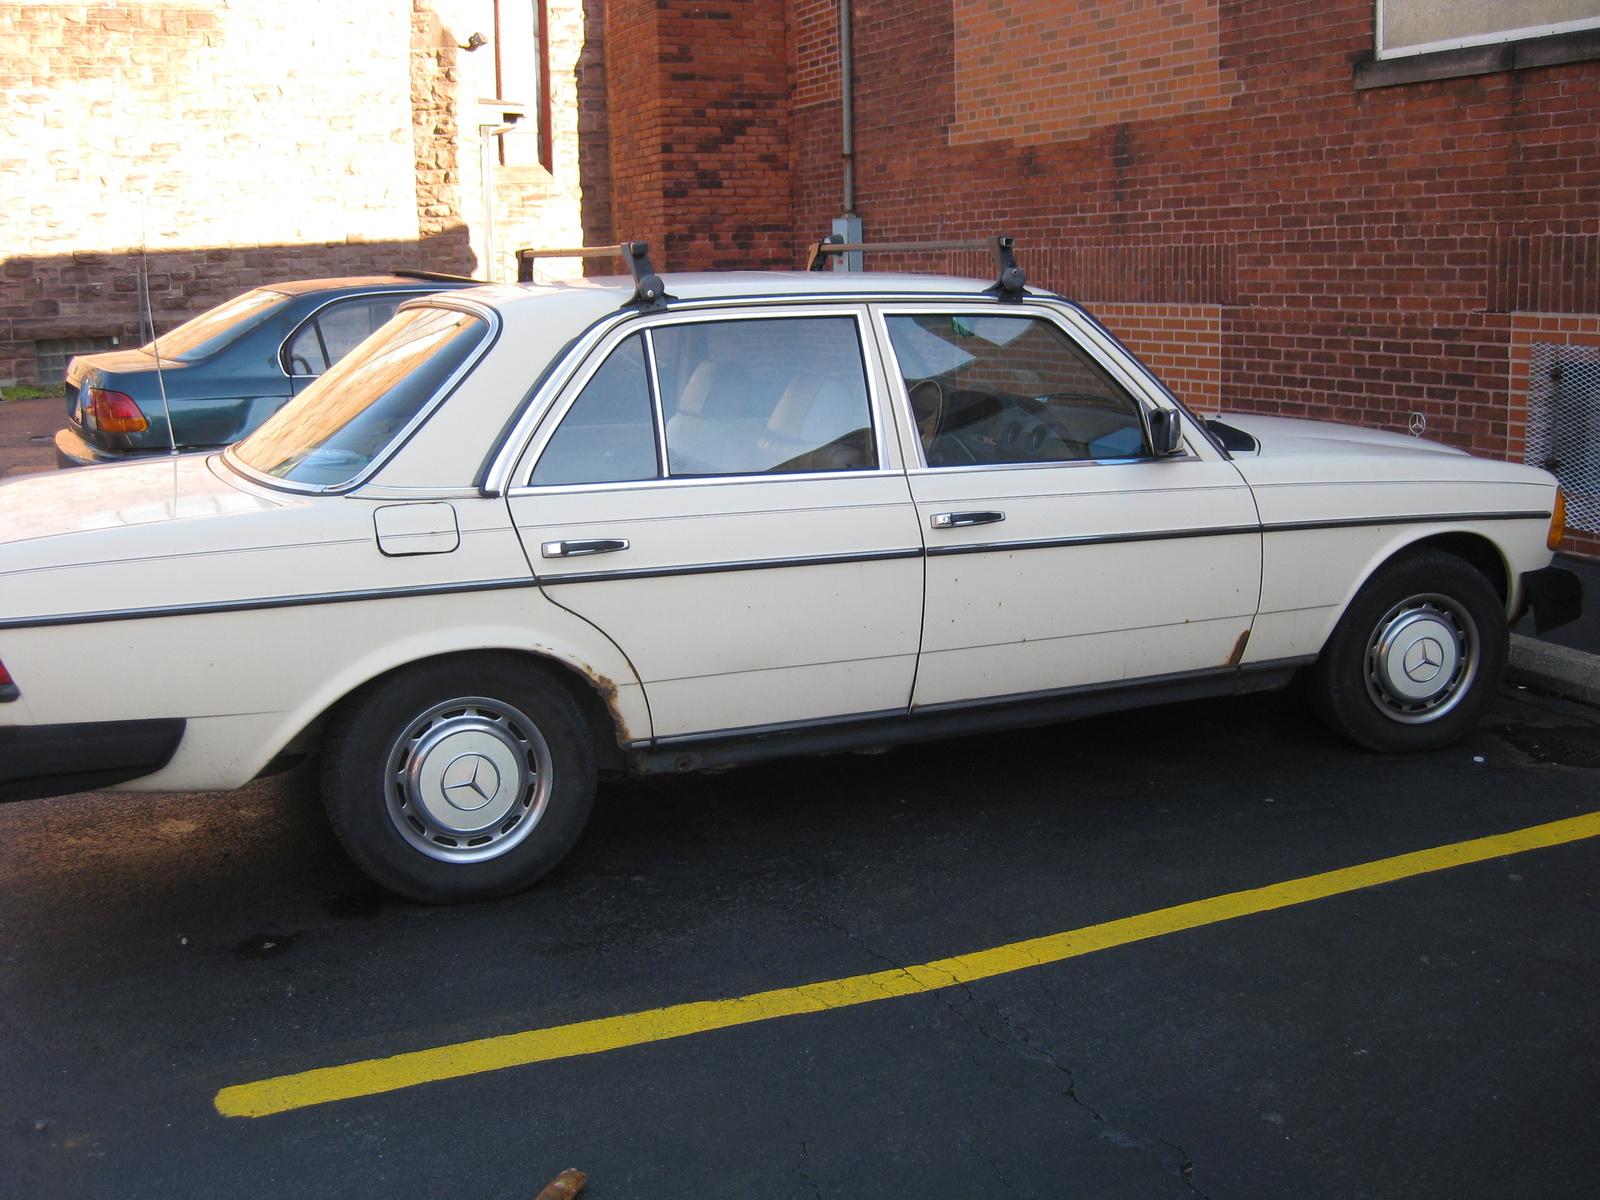 1983 mercedes benz 240 pictures cargurus for Mercedes benz cl 240